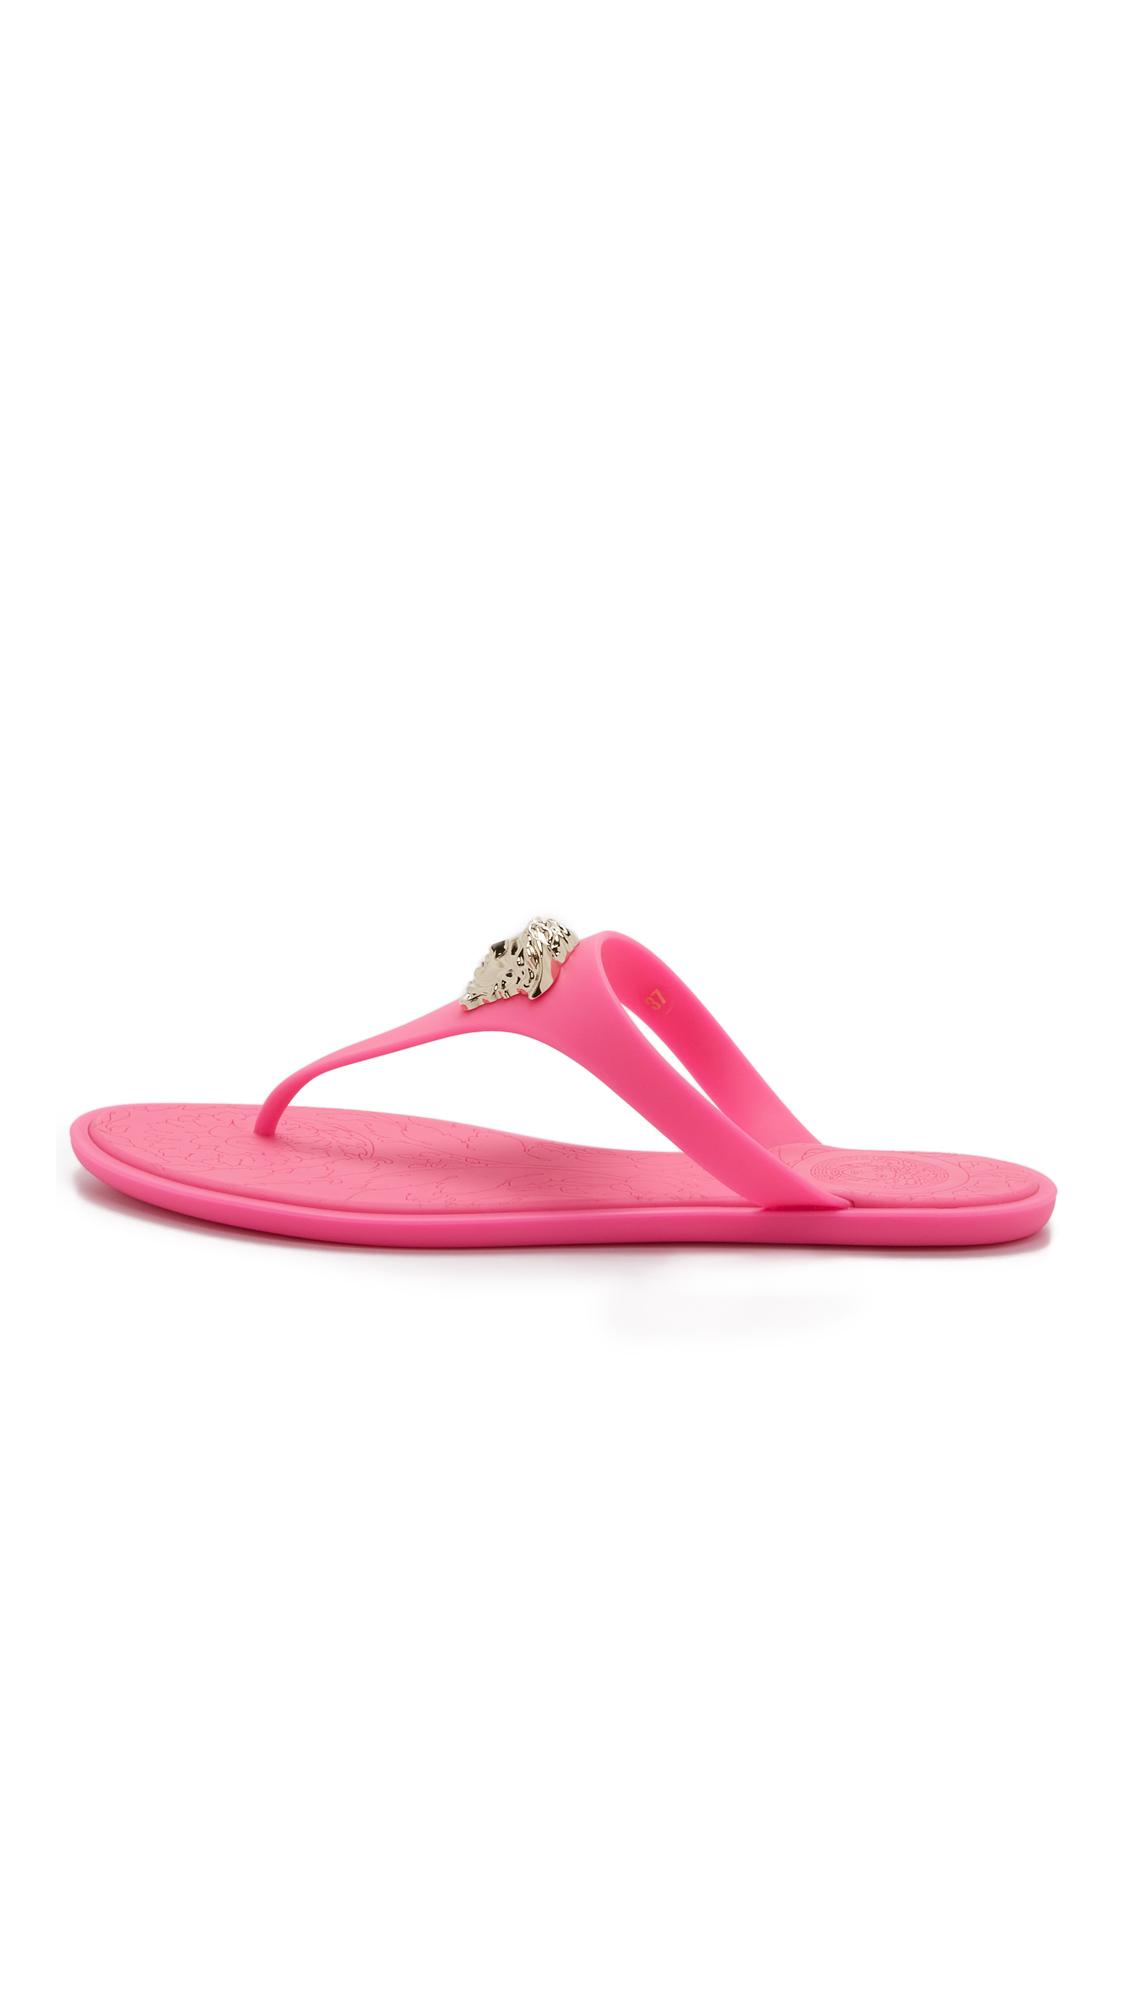 c088e3755d002 Versace Medusa Sandals